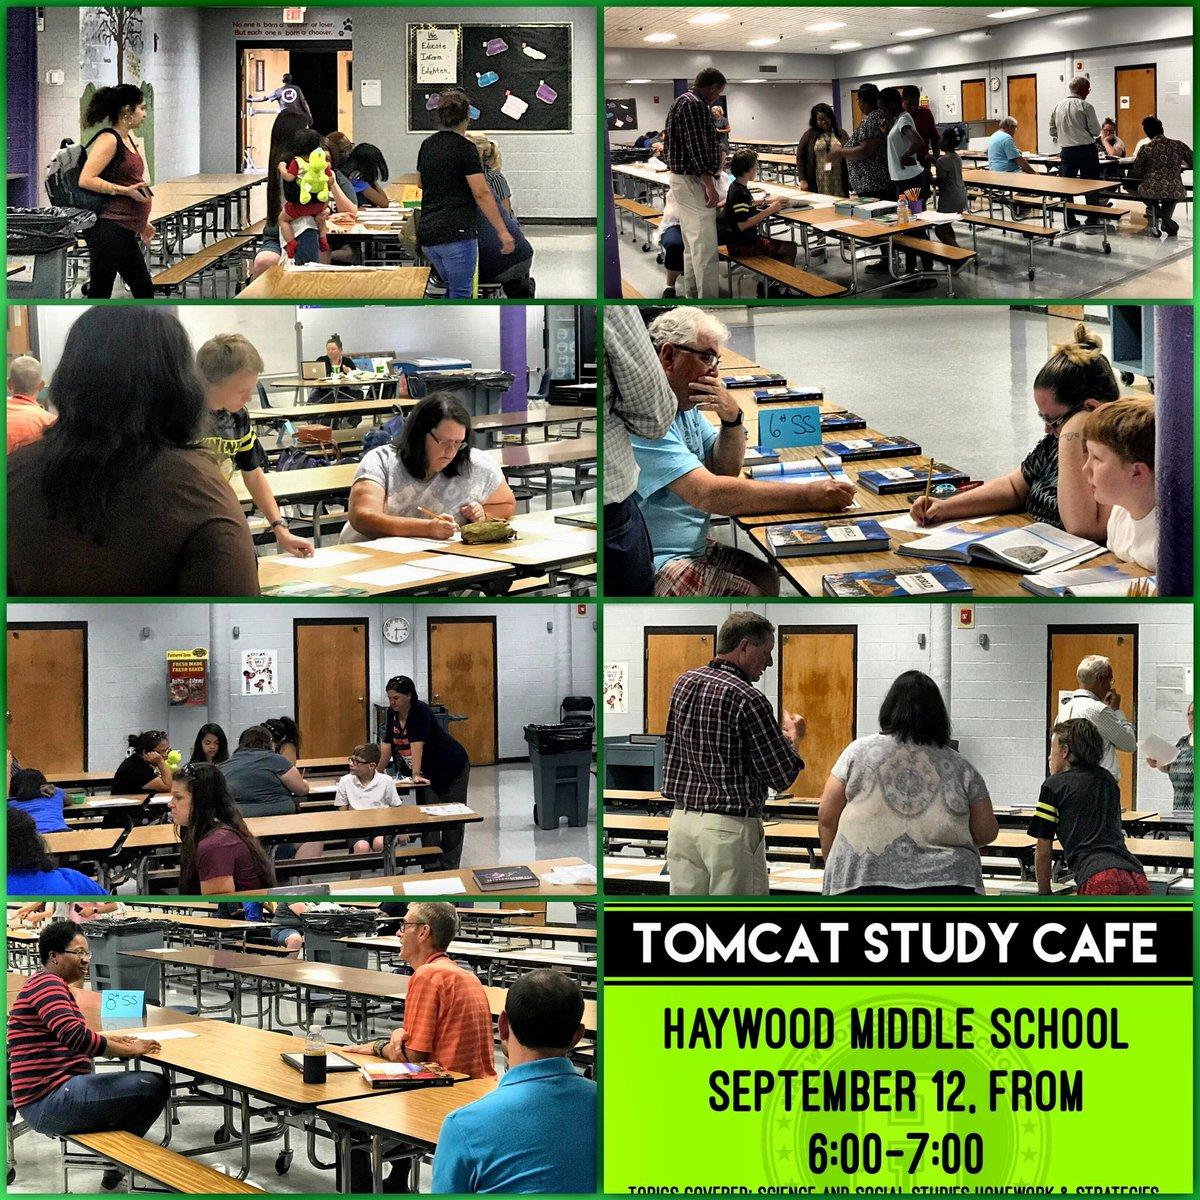 HMS Study Cafe Science & Social Studies #makeithappen <br>http://pic.twitter.com/BaheQA1Gq4